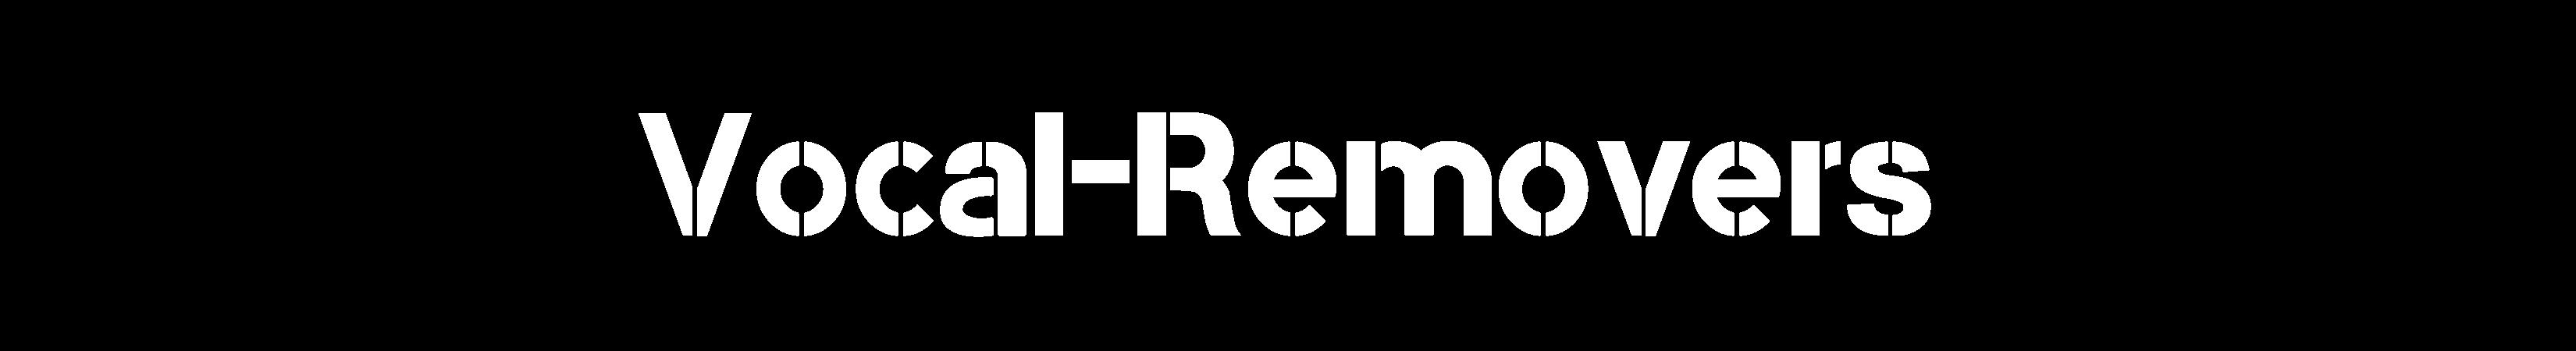 Best Vocal Remover Online